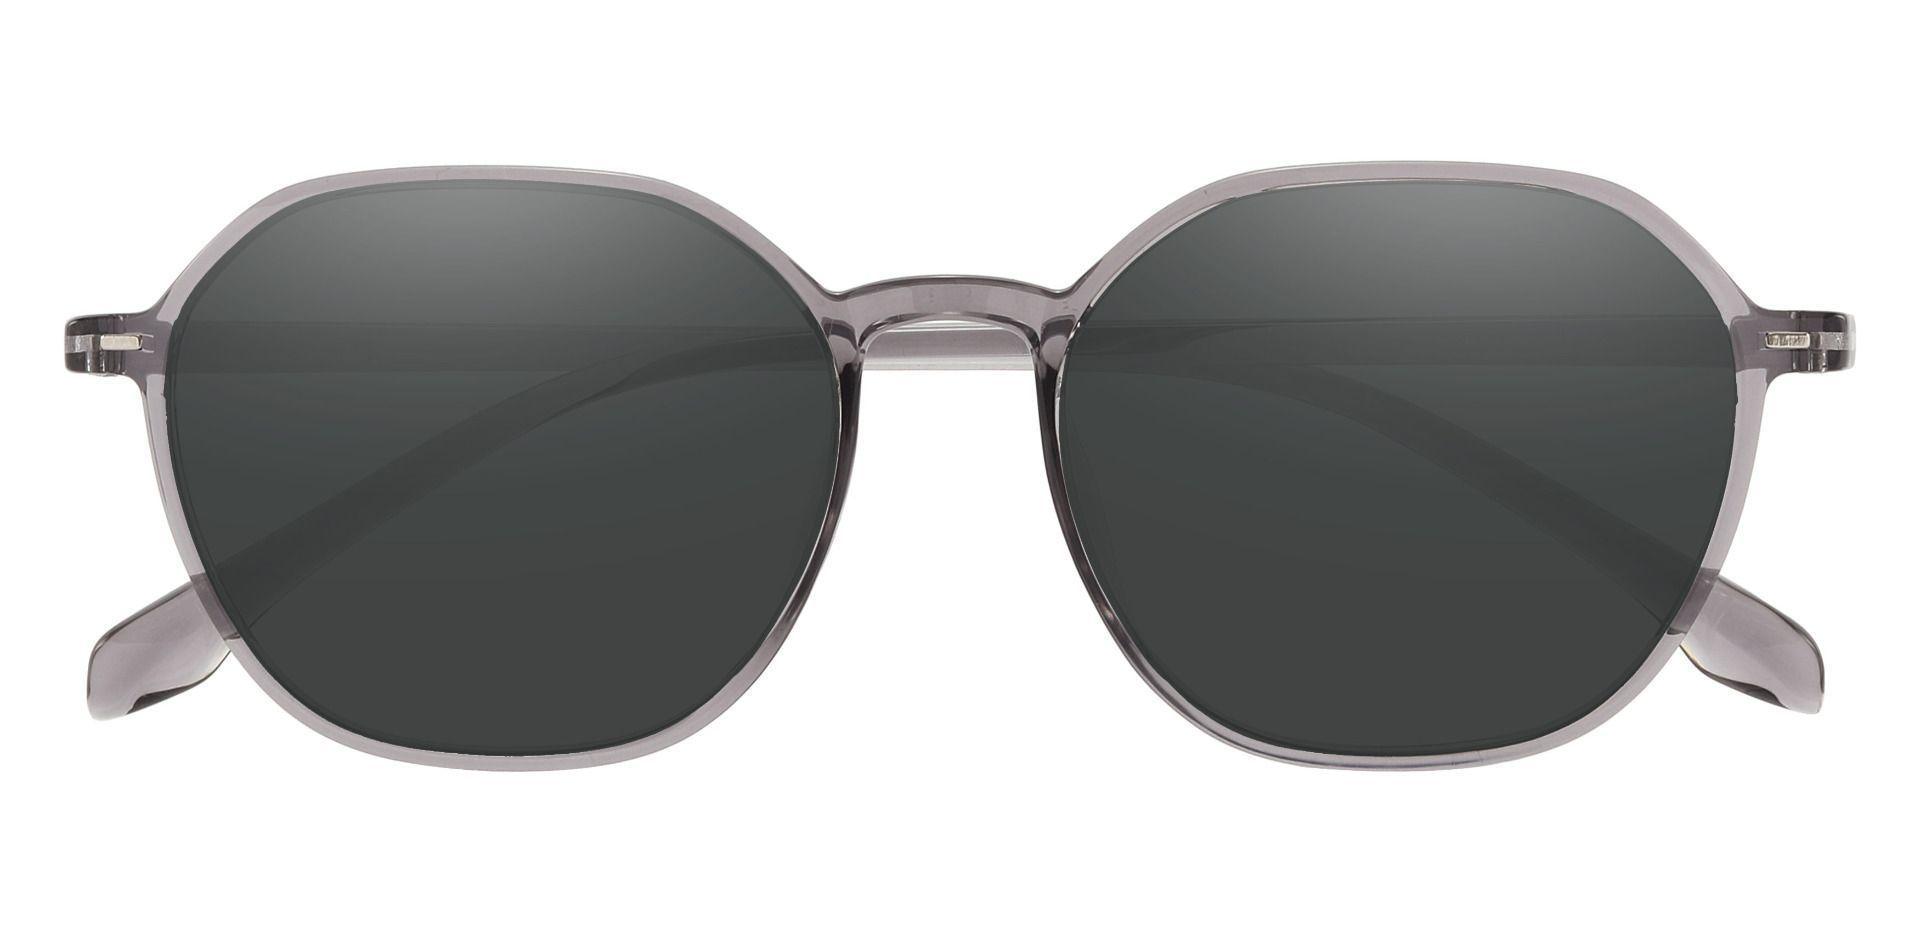 Detroit Geometric Prescription Sunglasses - Gray Frame With Gray Lenses